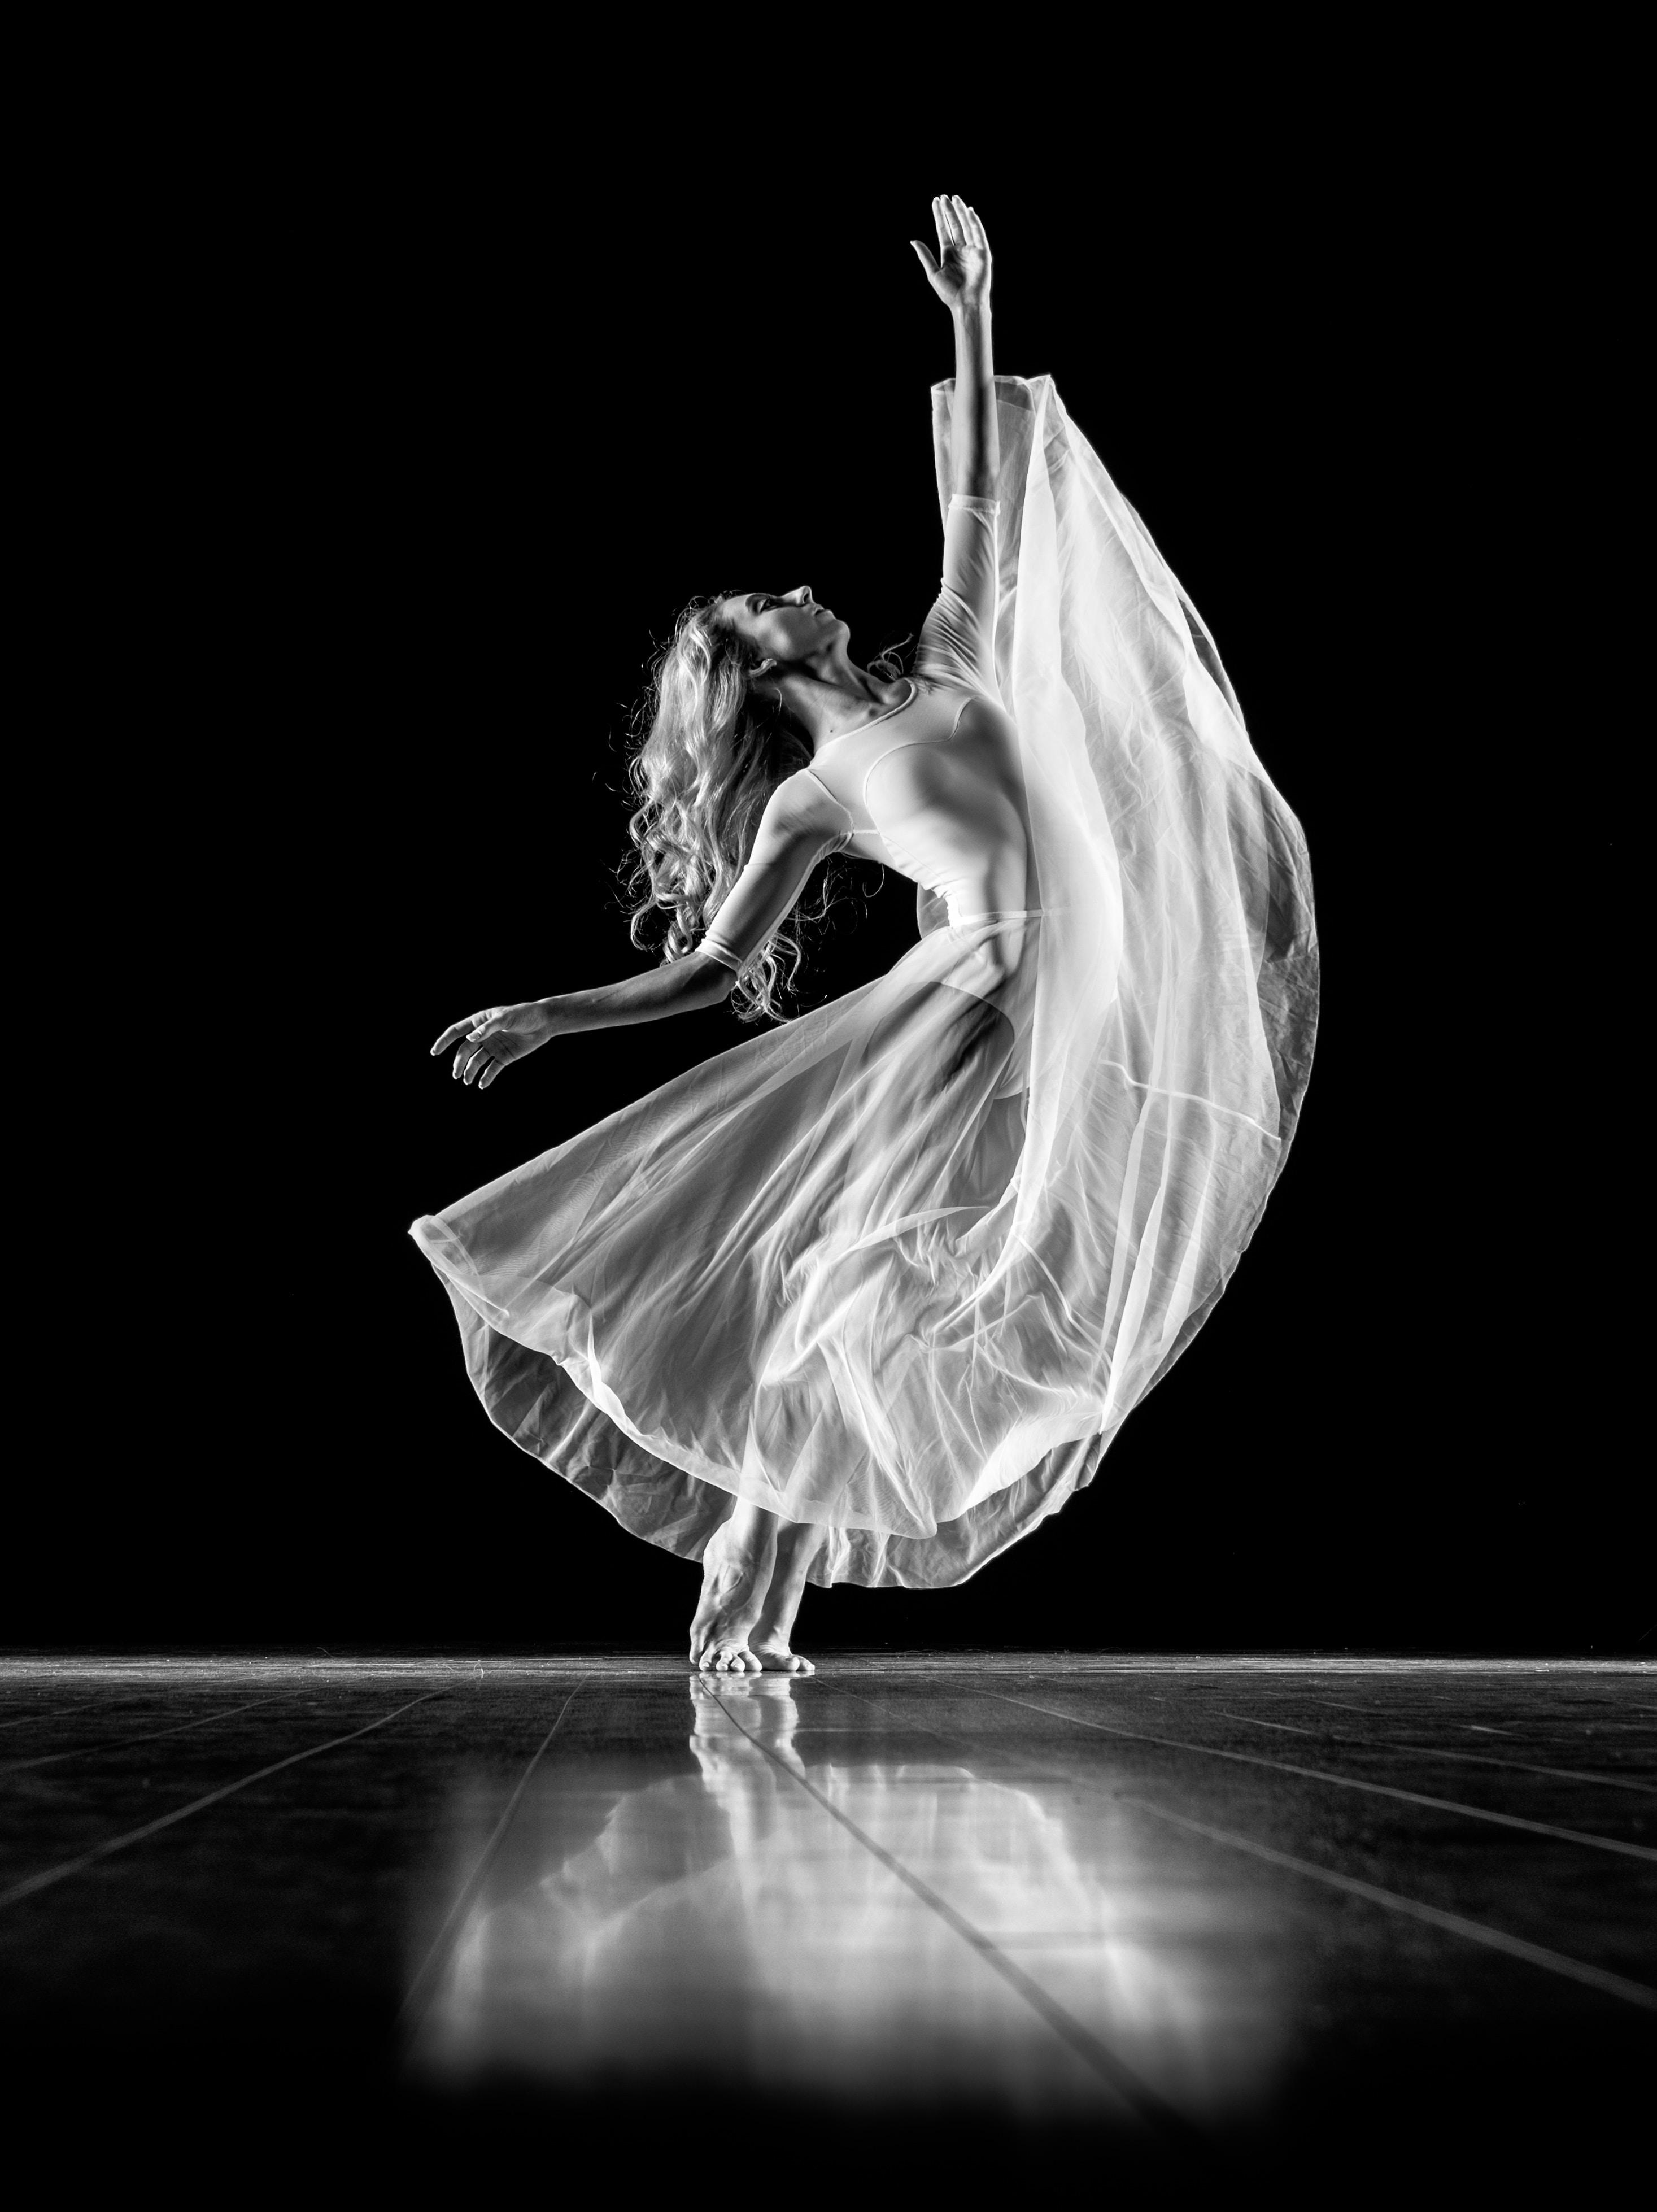 The Music Dancer swords stories